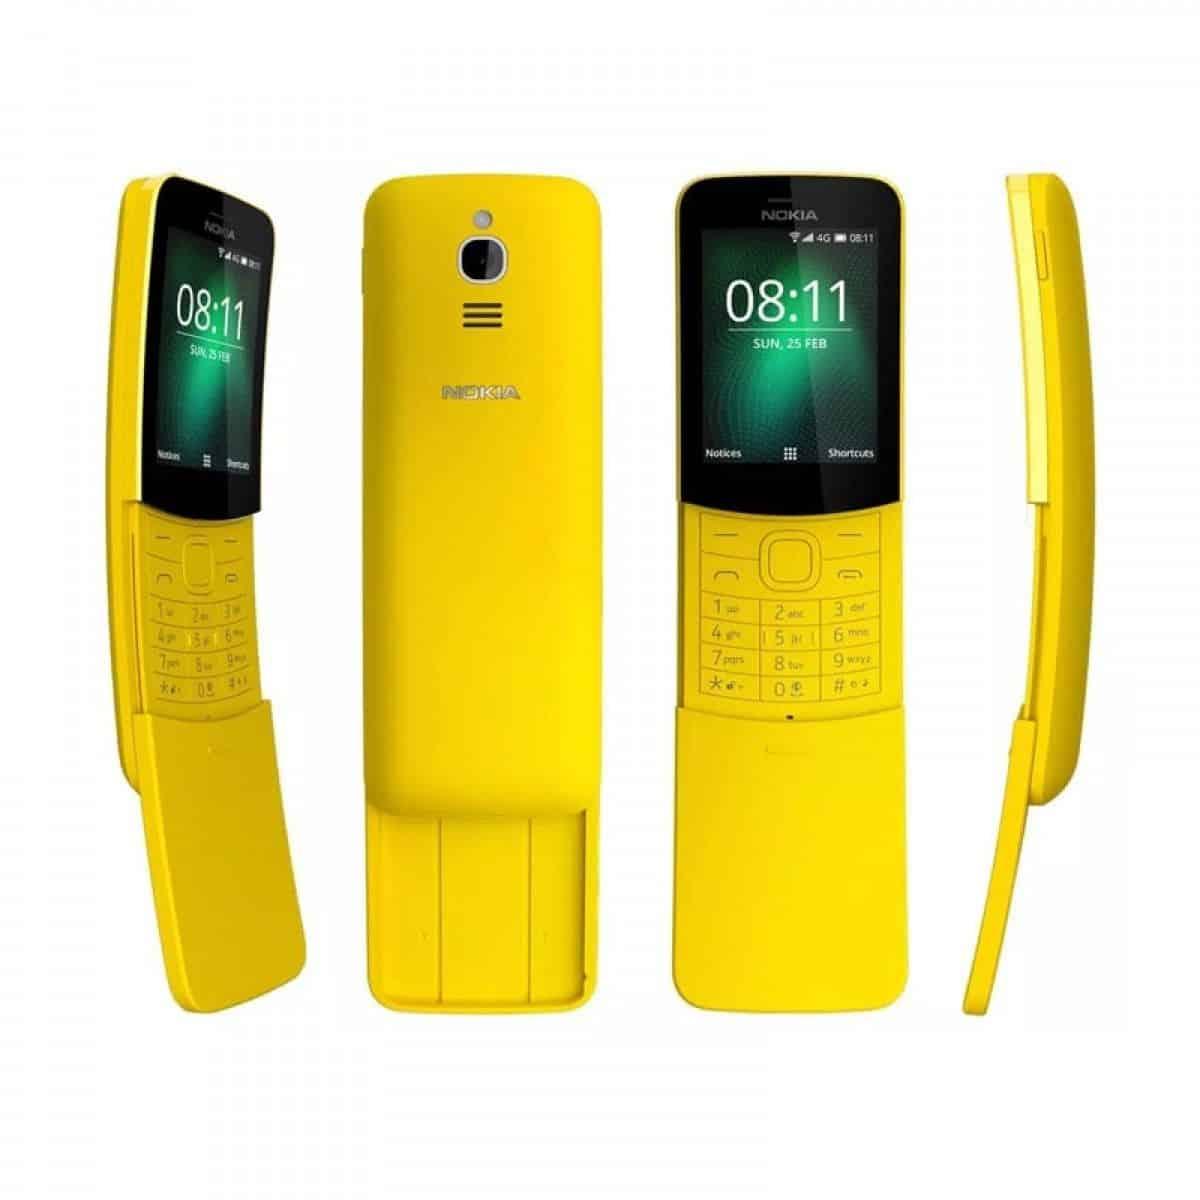 International Version Nokia 8110 4G Single-SIM 4GB TA-1071 SS Factory Unlocked 4G Smartphone Black 2018